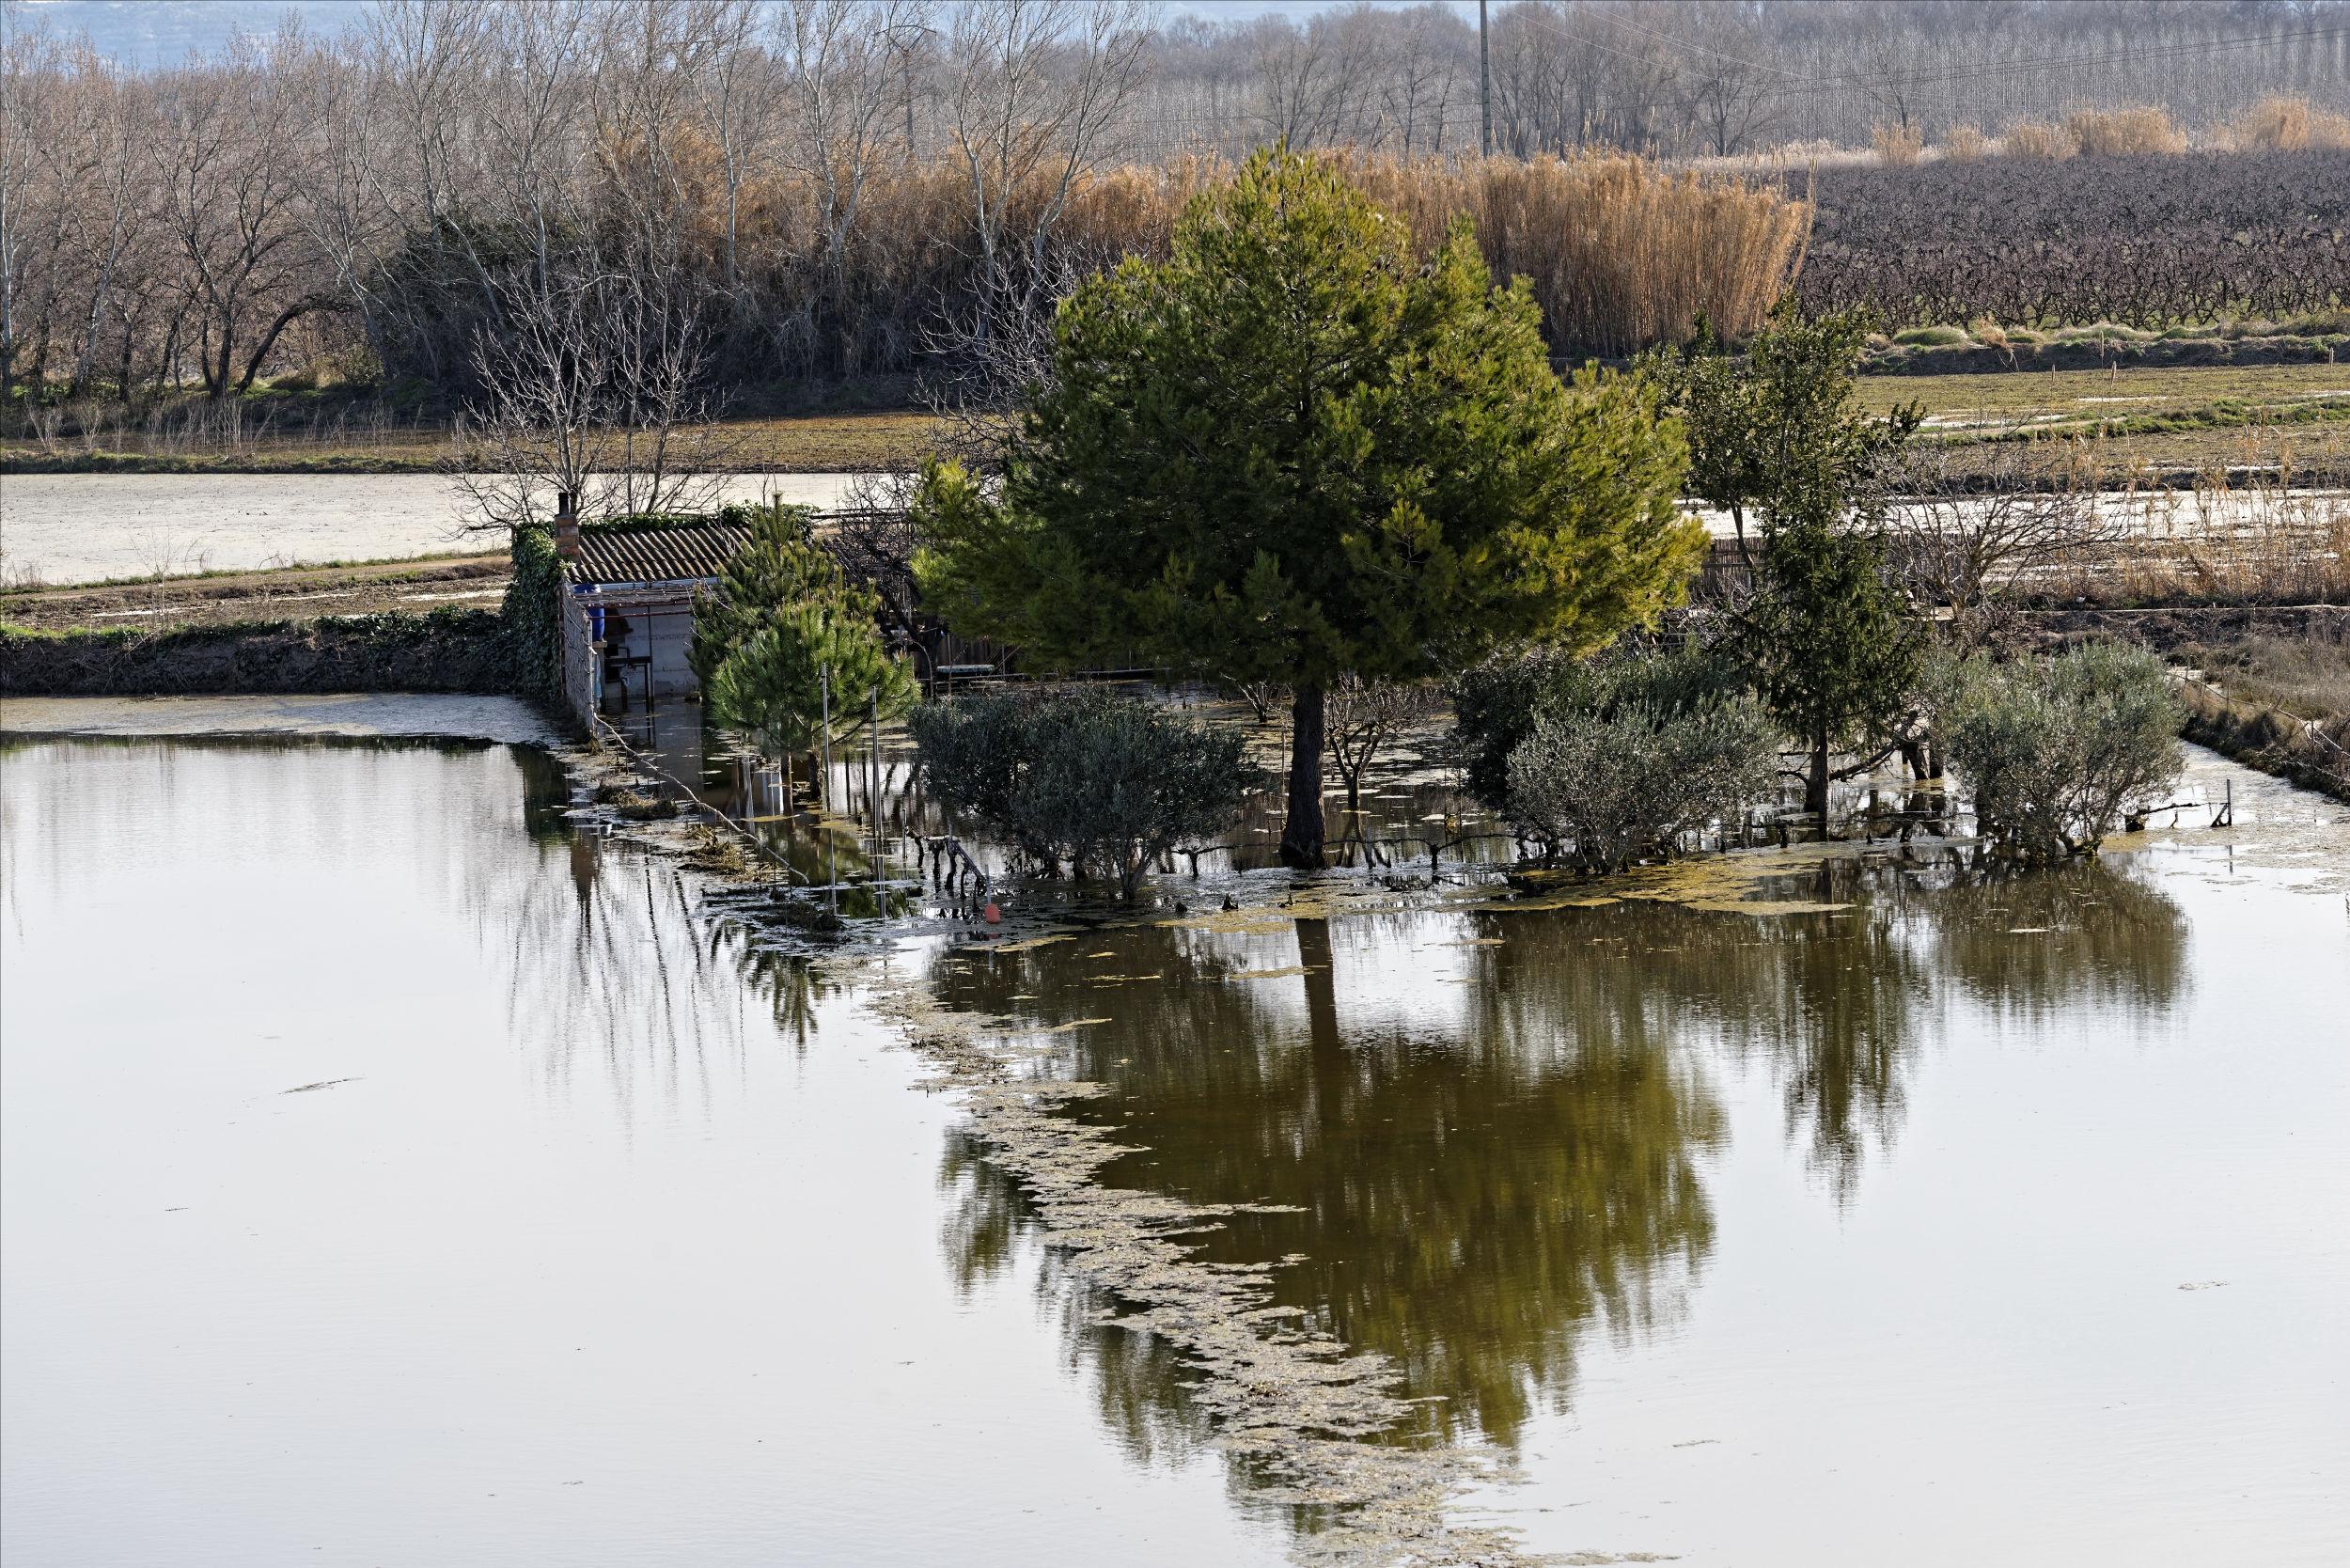 150308-Alfaro - Los Sotos del Ebro (La Rioja) (11)